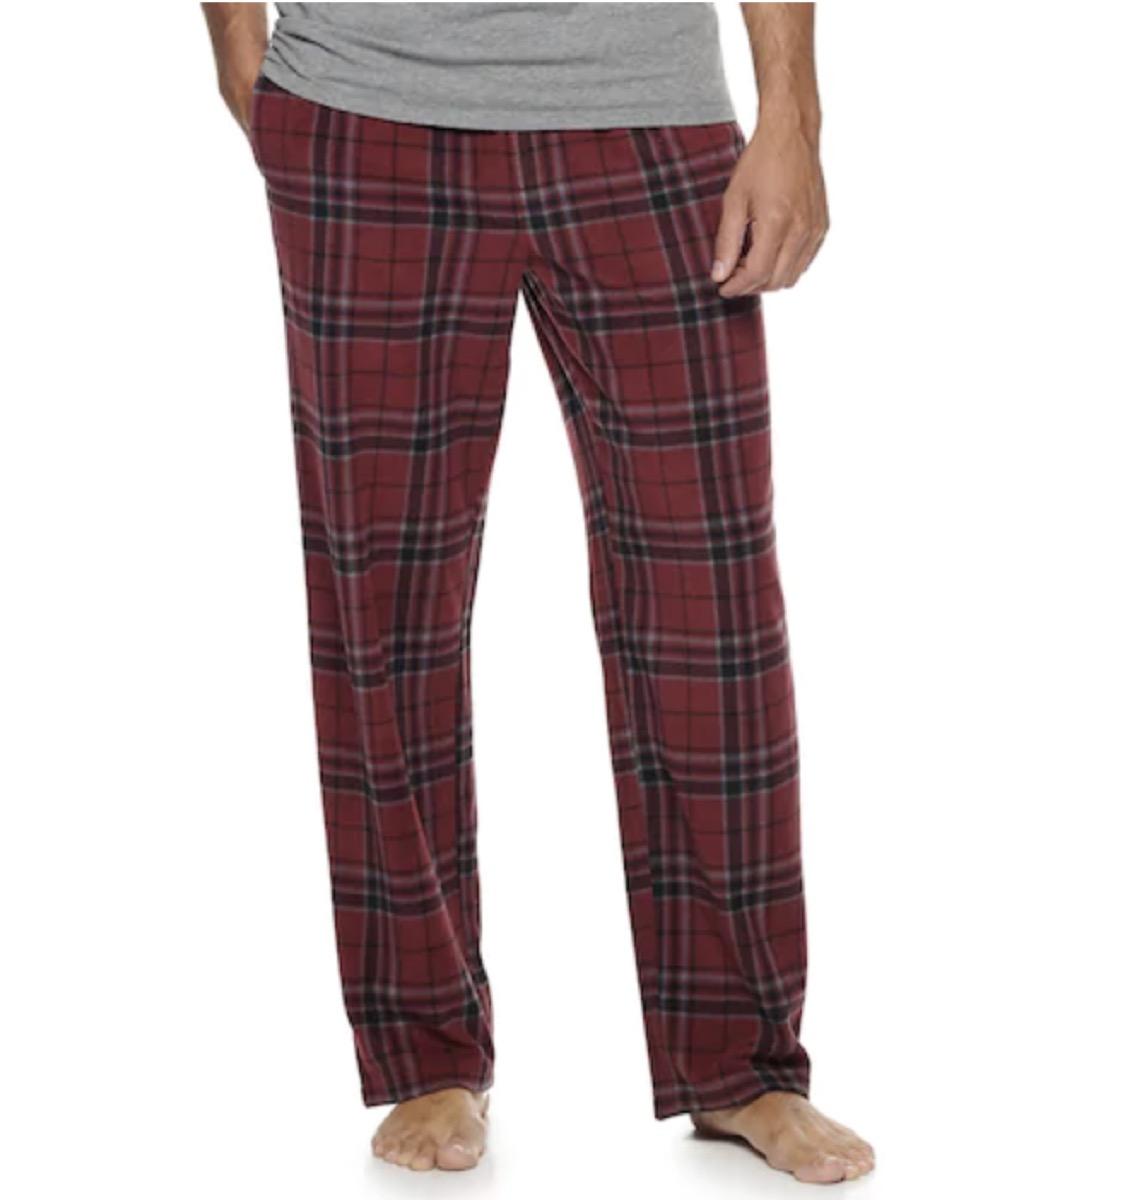 microfleece sleep pants in red plaid